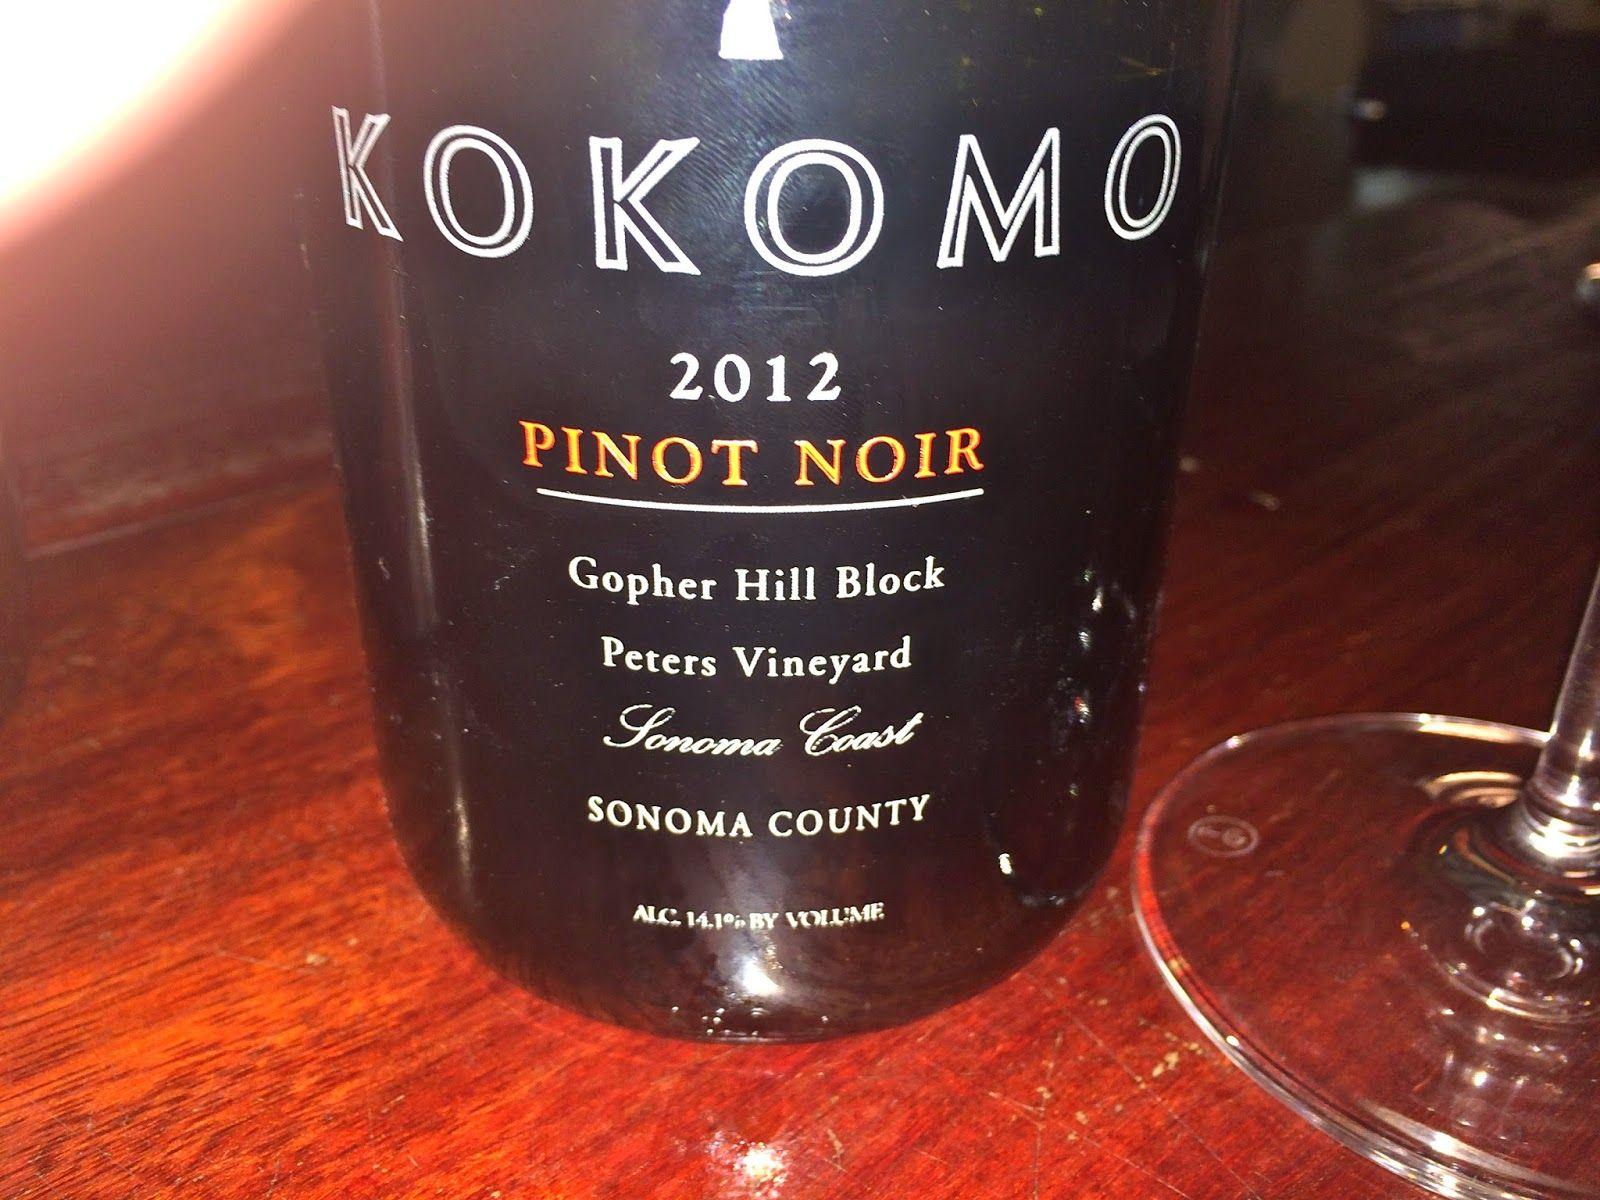 Tasting Pinot Noir At Kokomo Winery Spaswinefood Wine Tasting Kokomo Winery